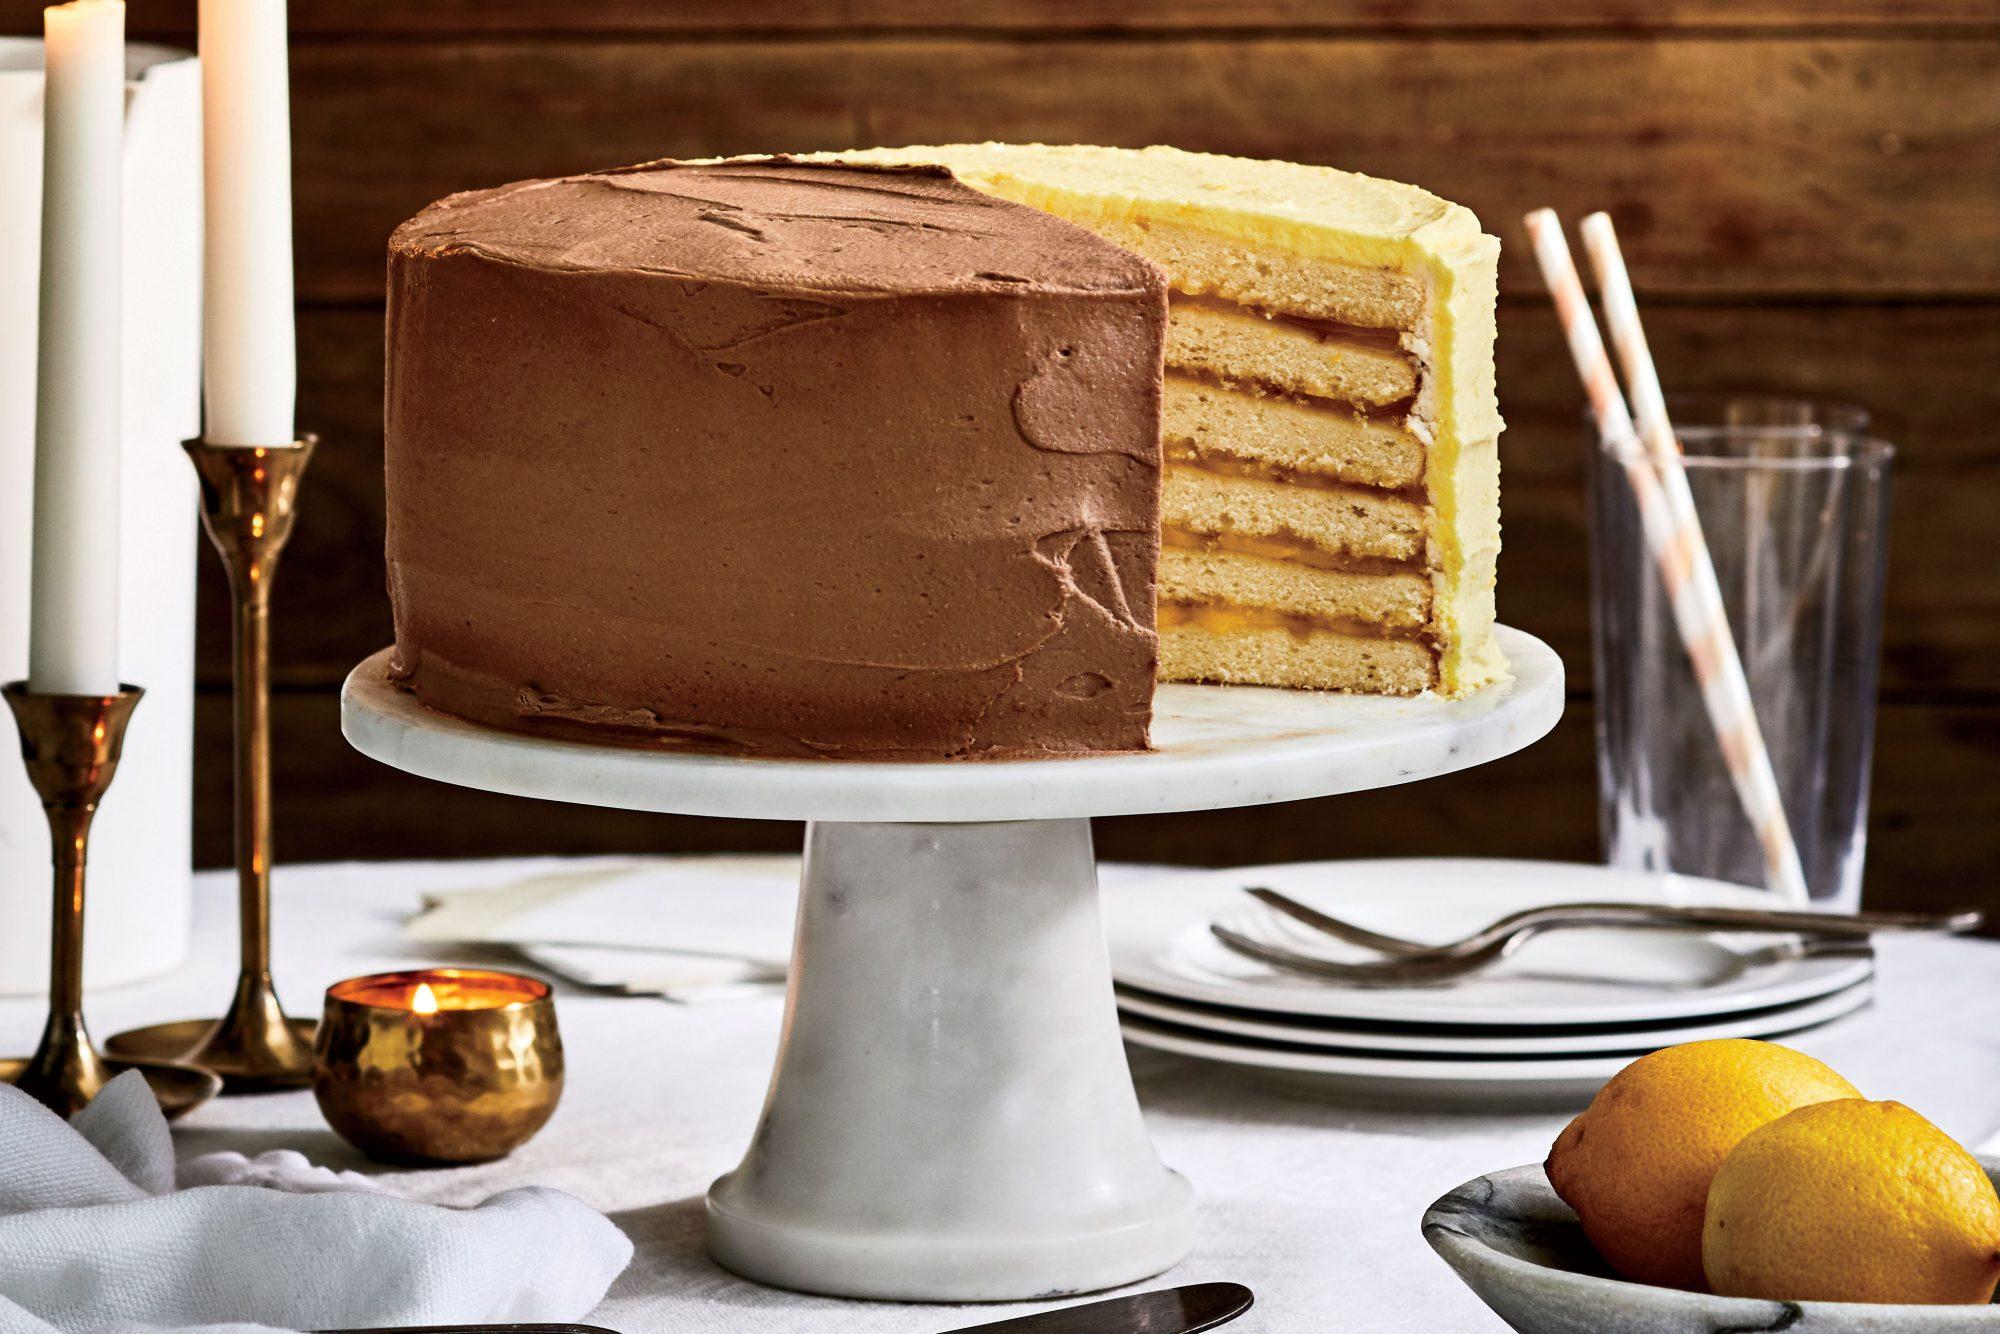 Lemon-and-Chocolate Doberge Cake